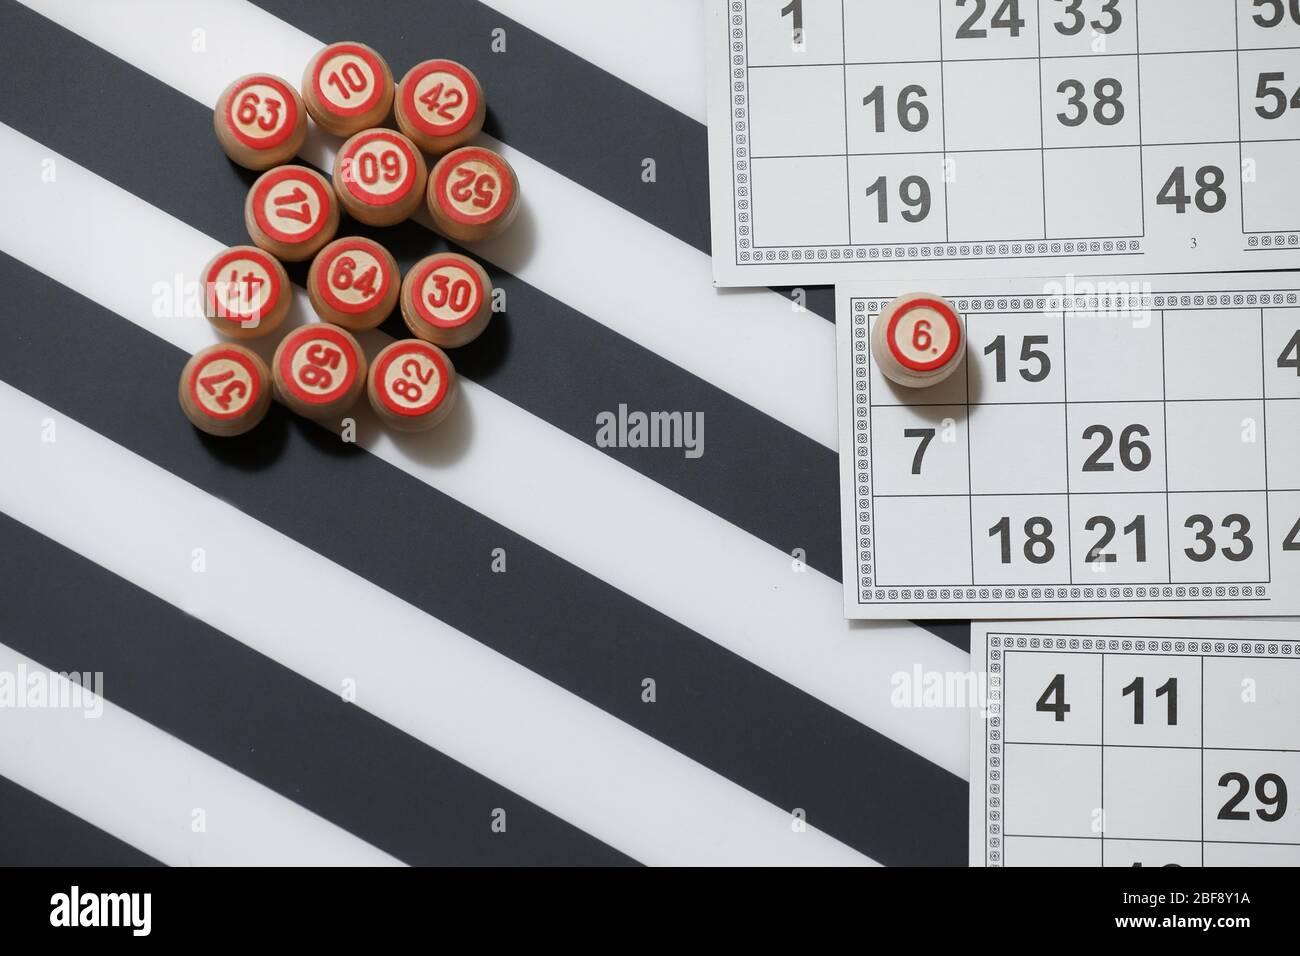 Bingo black casino super mario flash 2 didi games